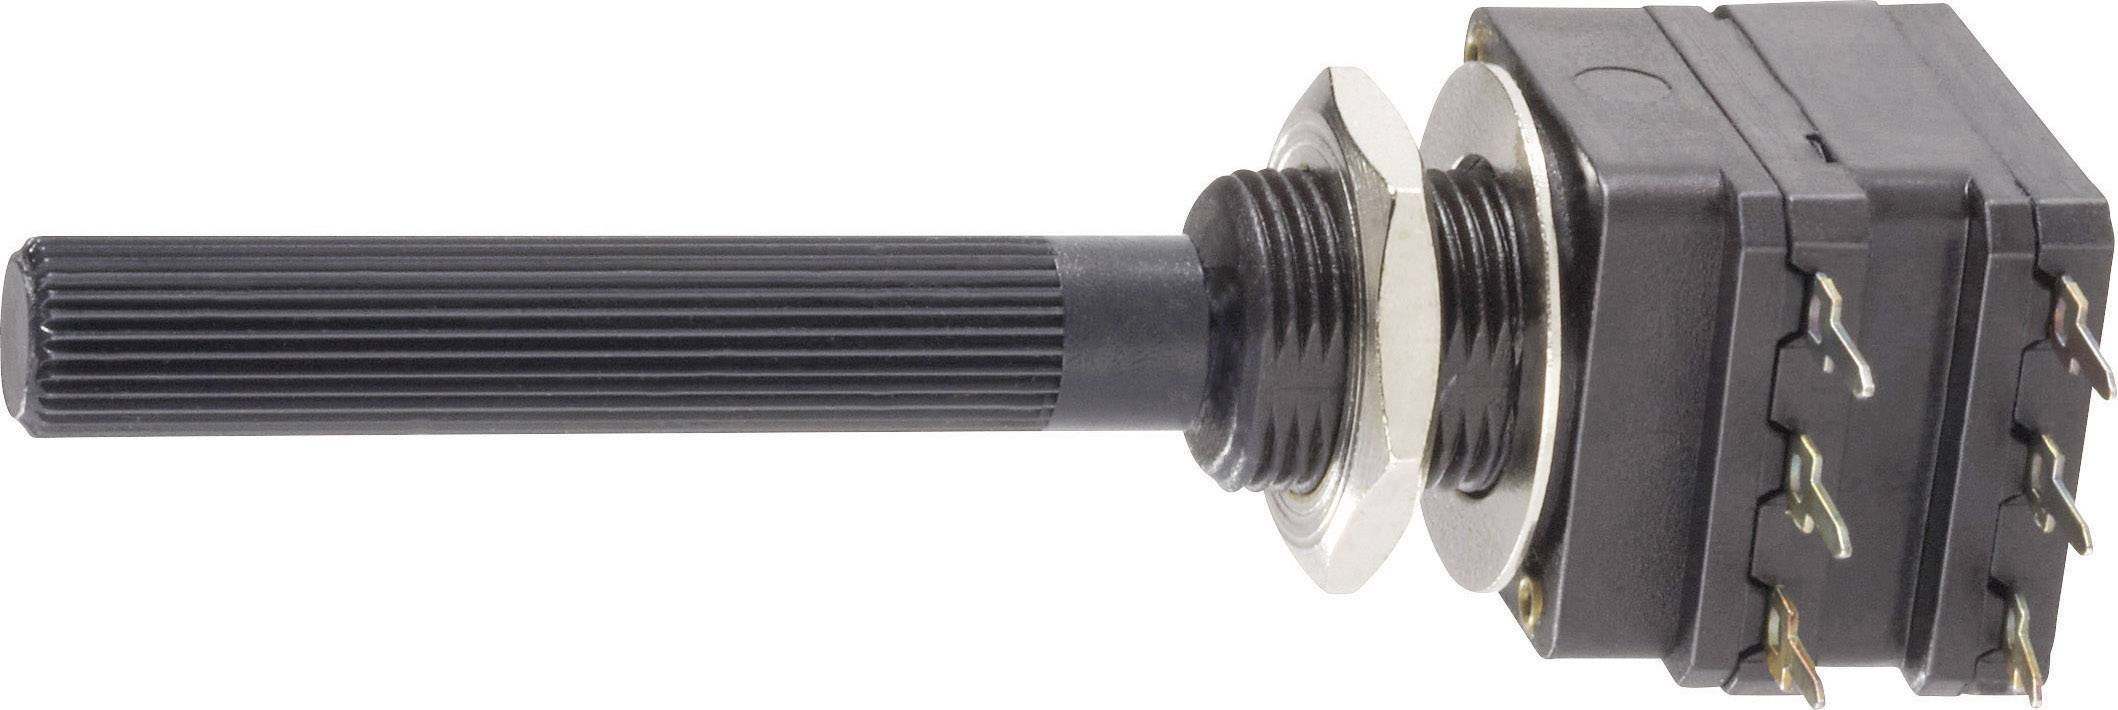 Otočný potenciometer stereo Piher PC16DH-10IP06223B2020MTA PC16DH-10IP06223B2020MTA, 0.1 W, 22 kOhm, 1 ks